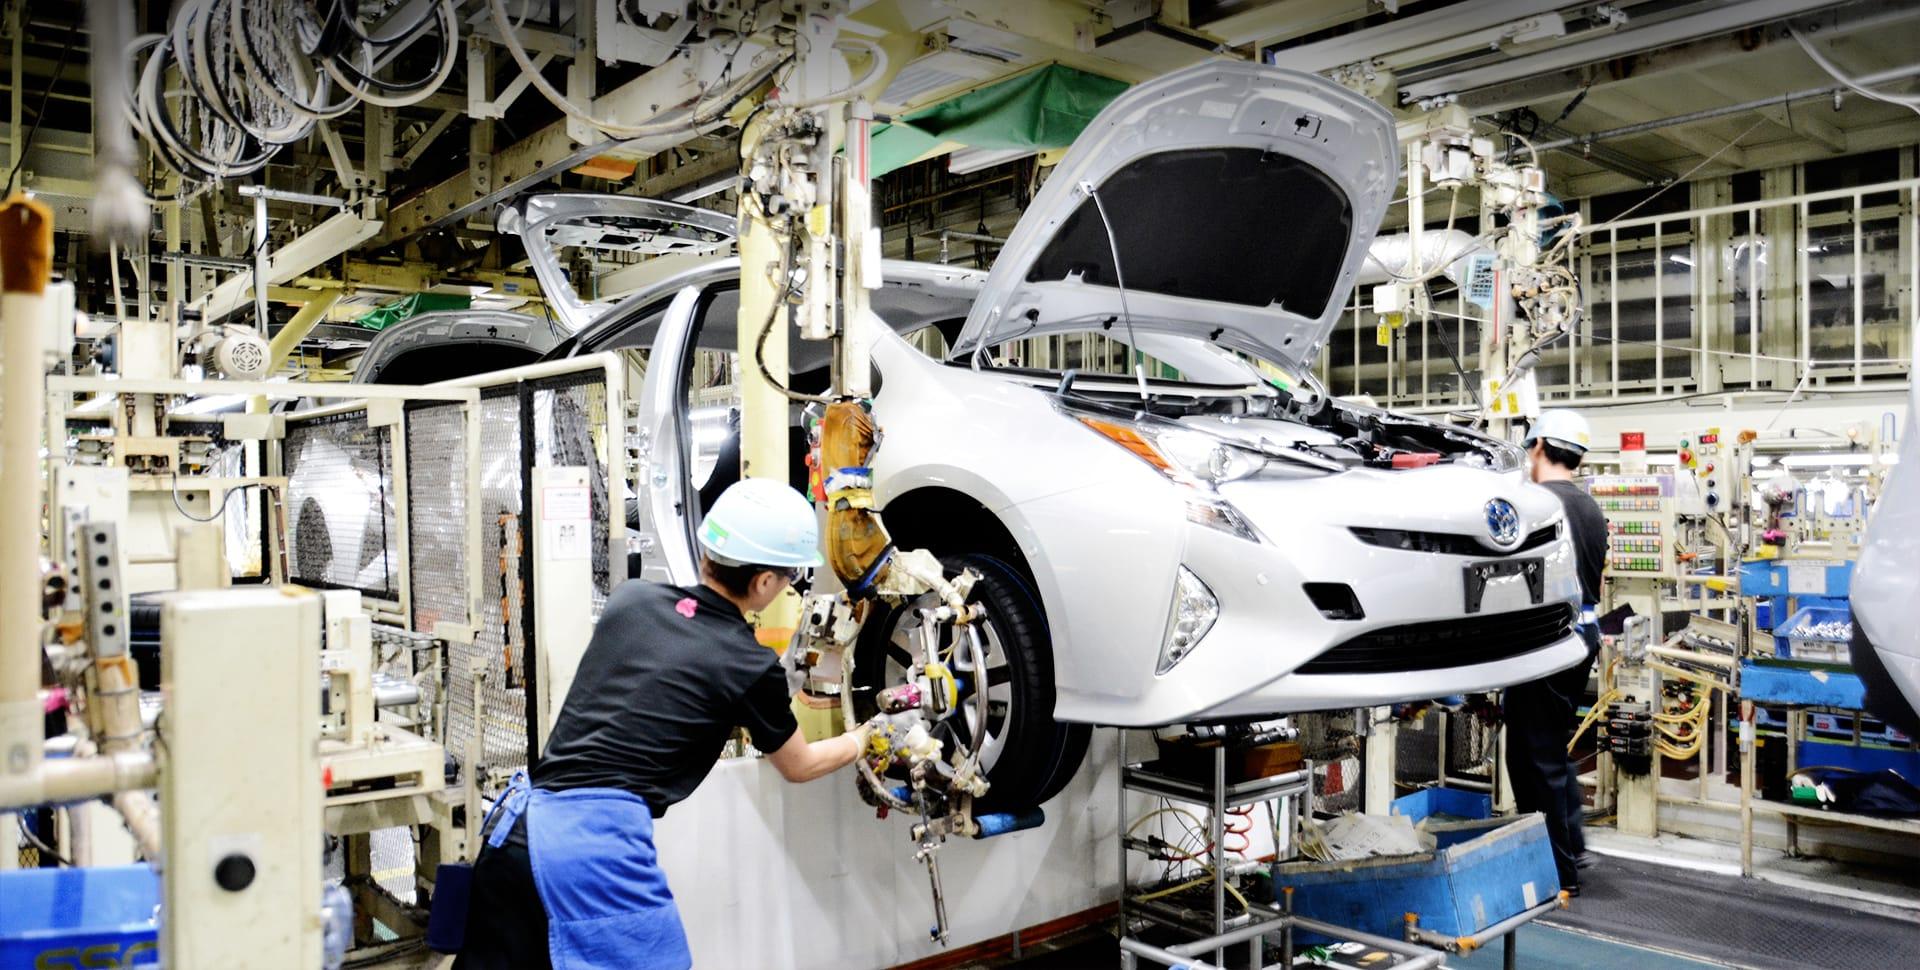 Totally Clean Car Manufacturing At An Environmentally Friendly